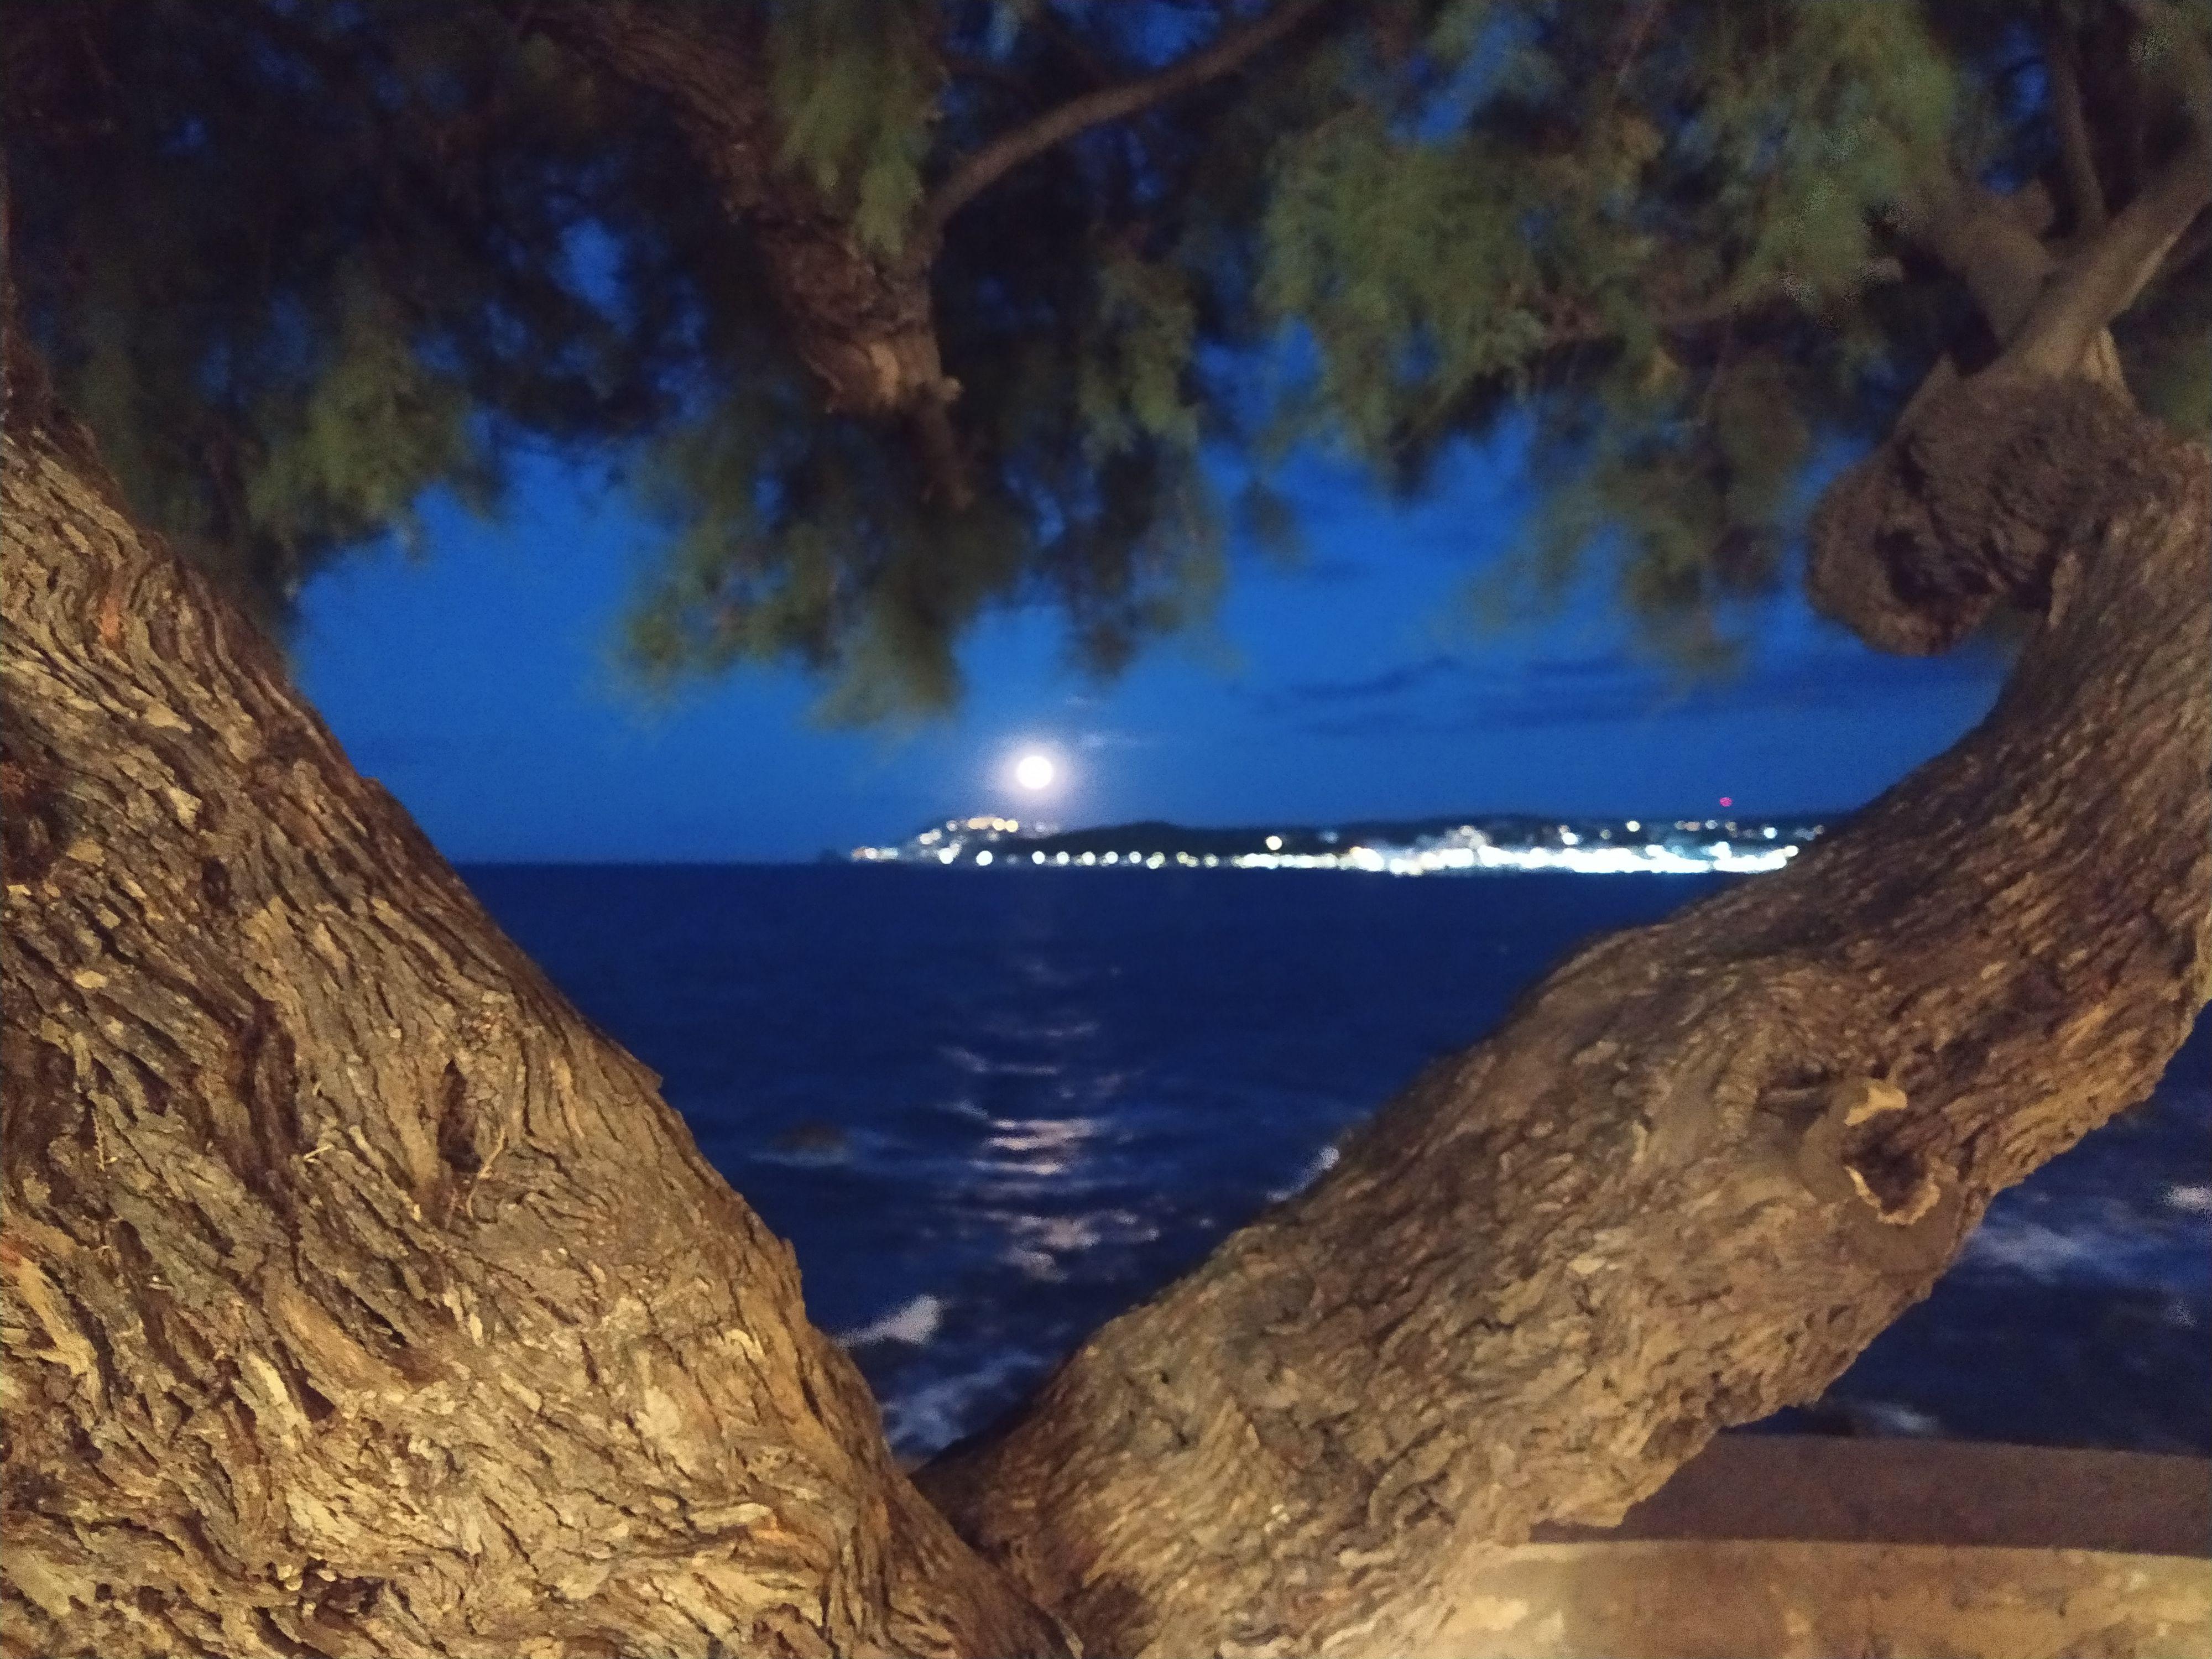 Lluna plena amb molt d amor L Escala (Girona)#Neus Cantós López 231